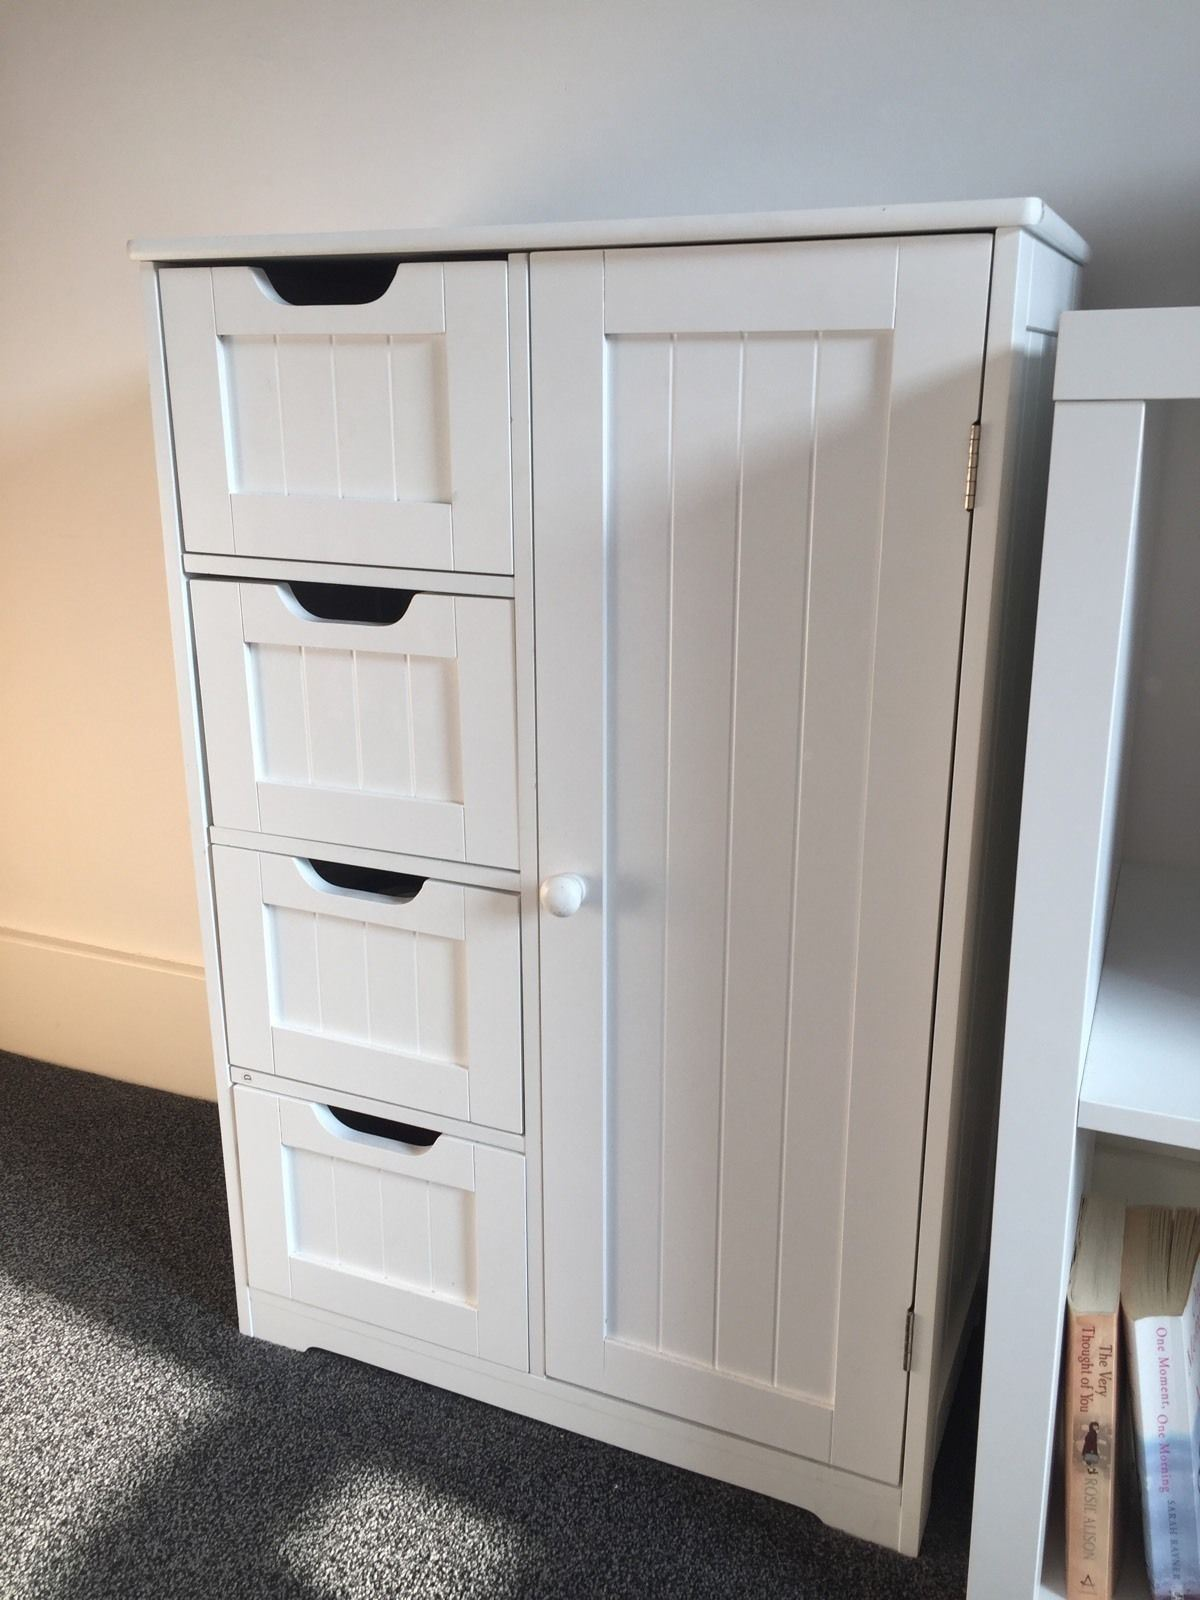 New-White-Wooden-Bathroom-Cabinet-Shelf-Furniture-Cupboard-Bedroom-Storage-Unit miniatuur 26